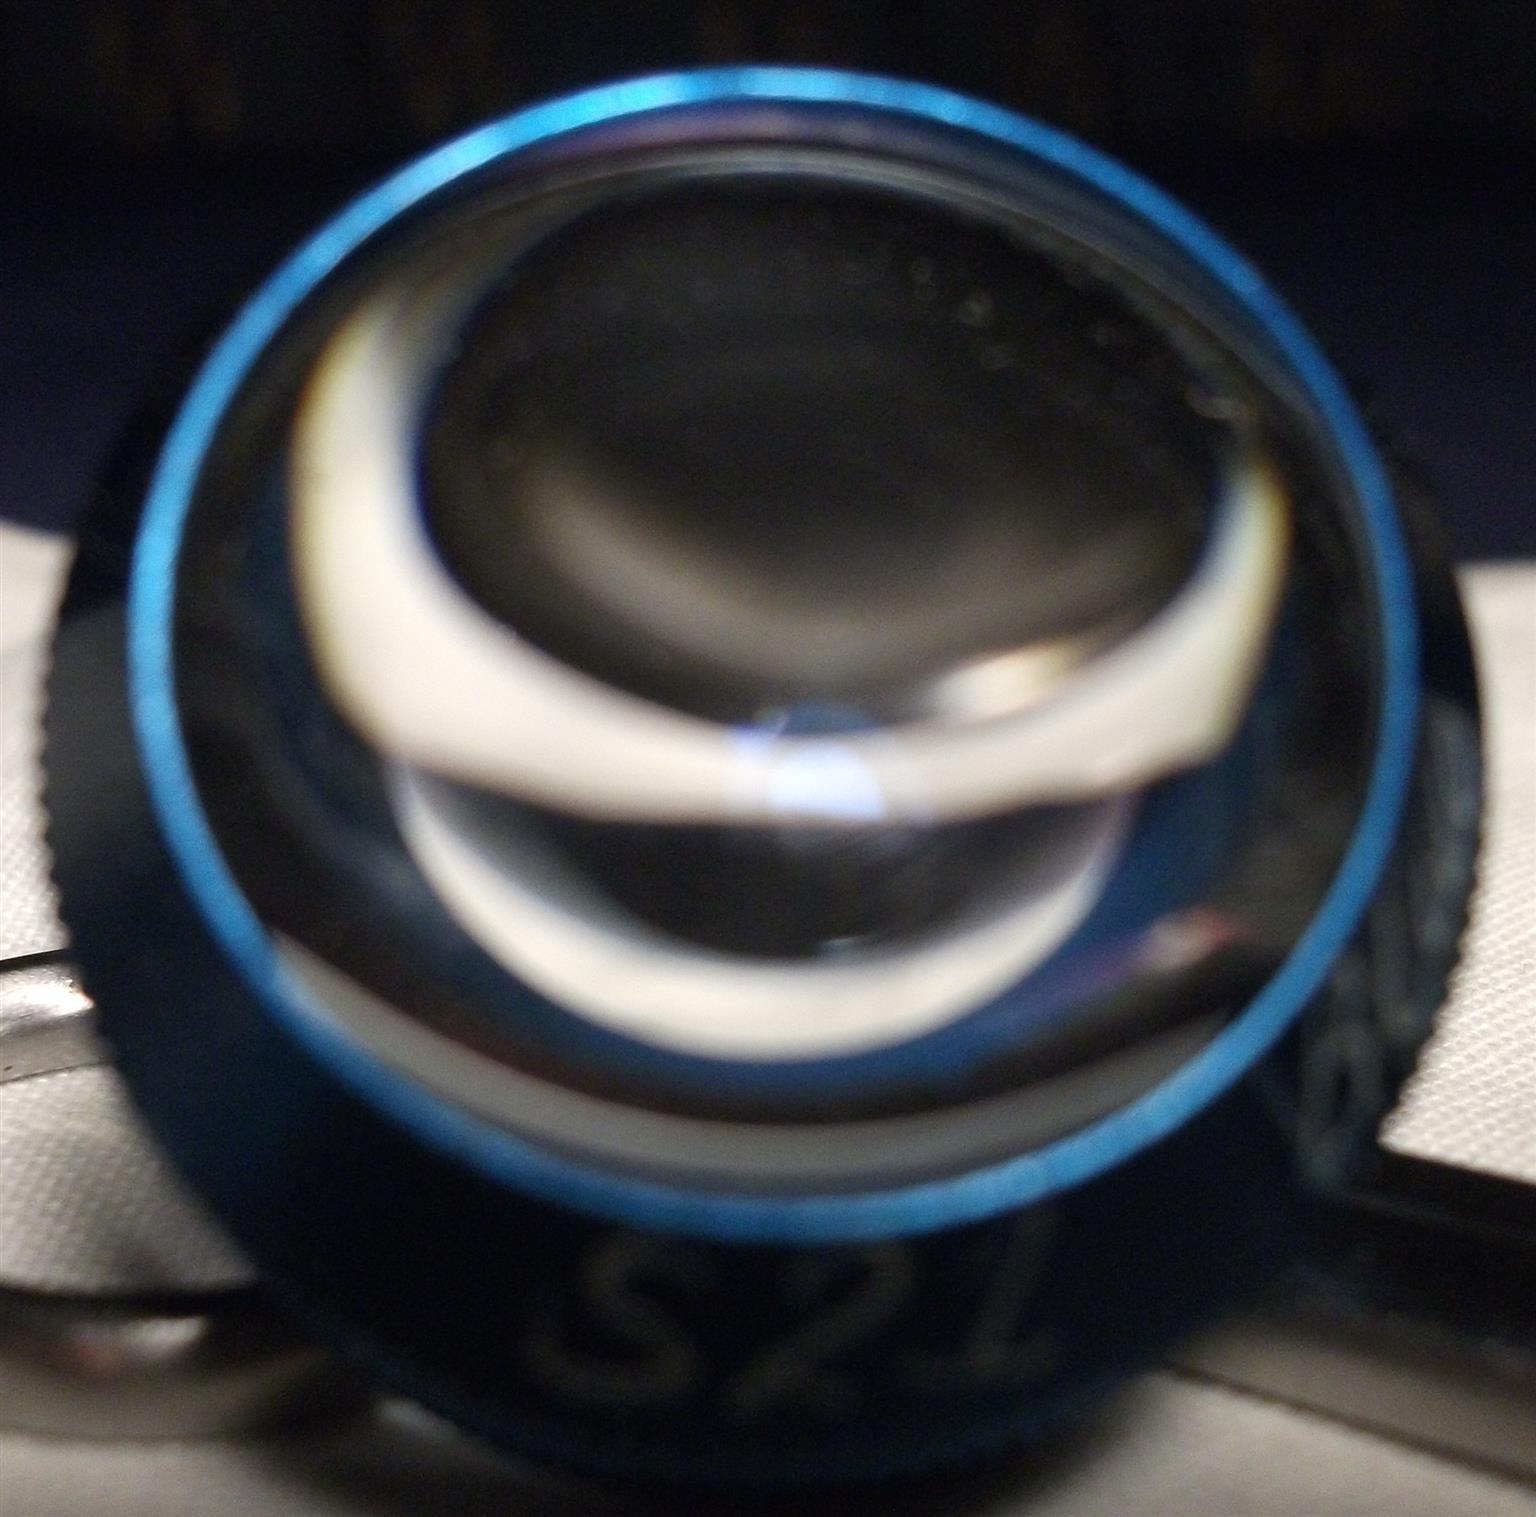 Volk Digital Wide-Field Ophthalmic Lens